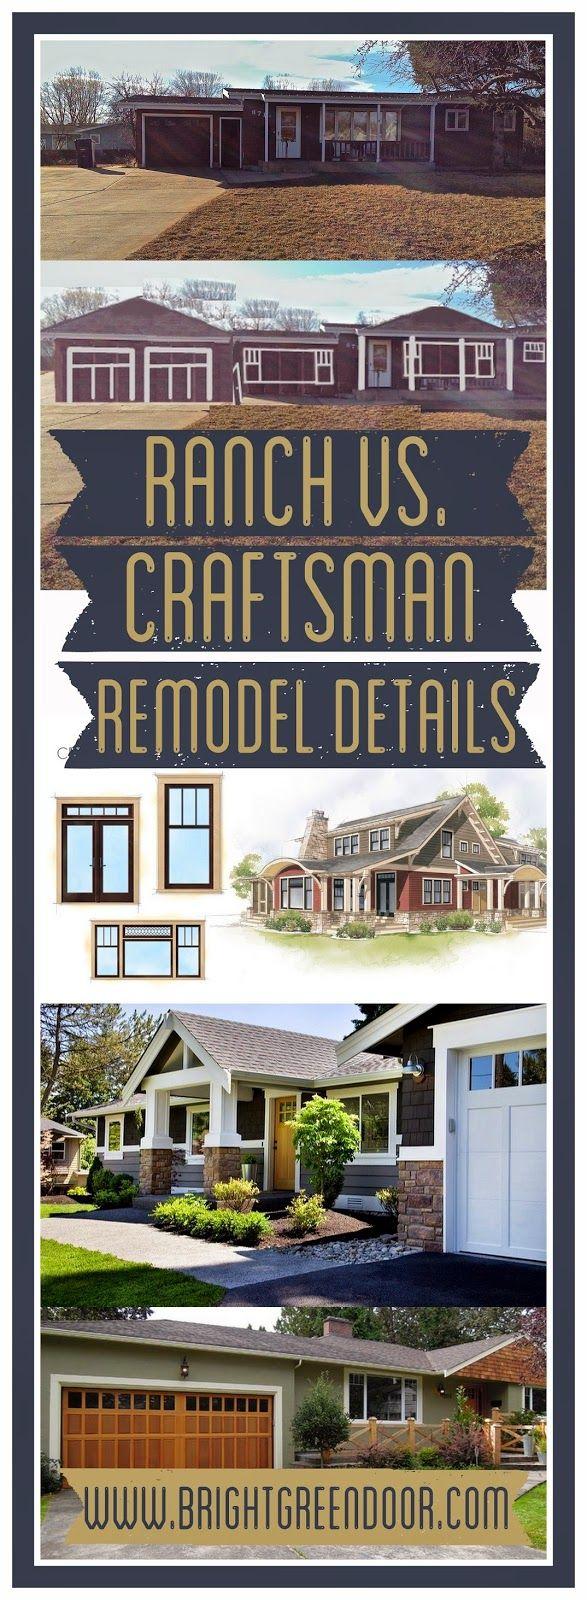 ranch vs craftsman remodel details - Craftsman Ranch Home Exterior